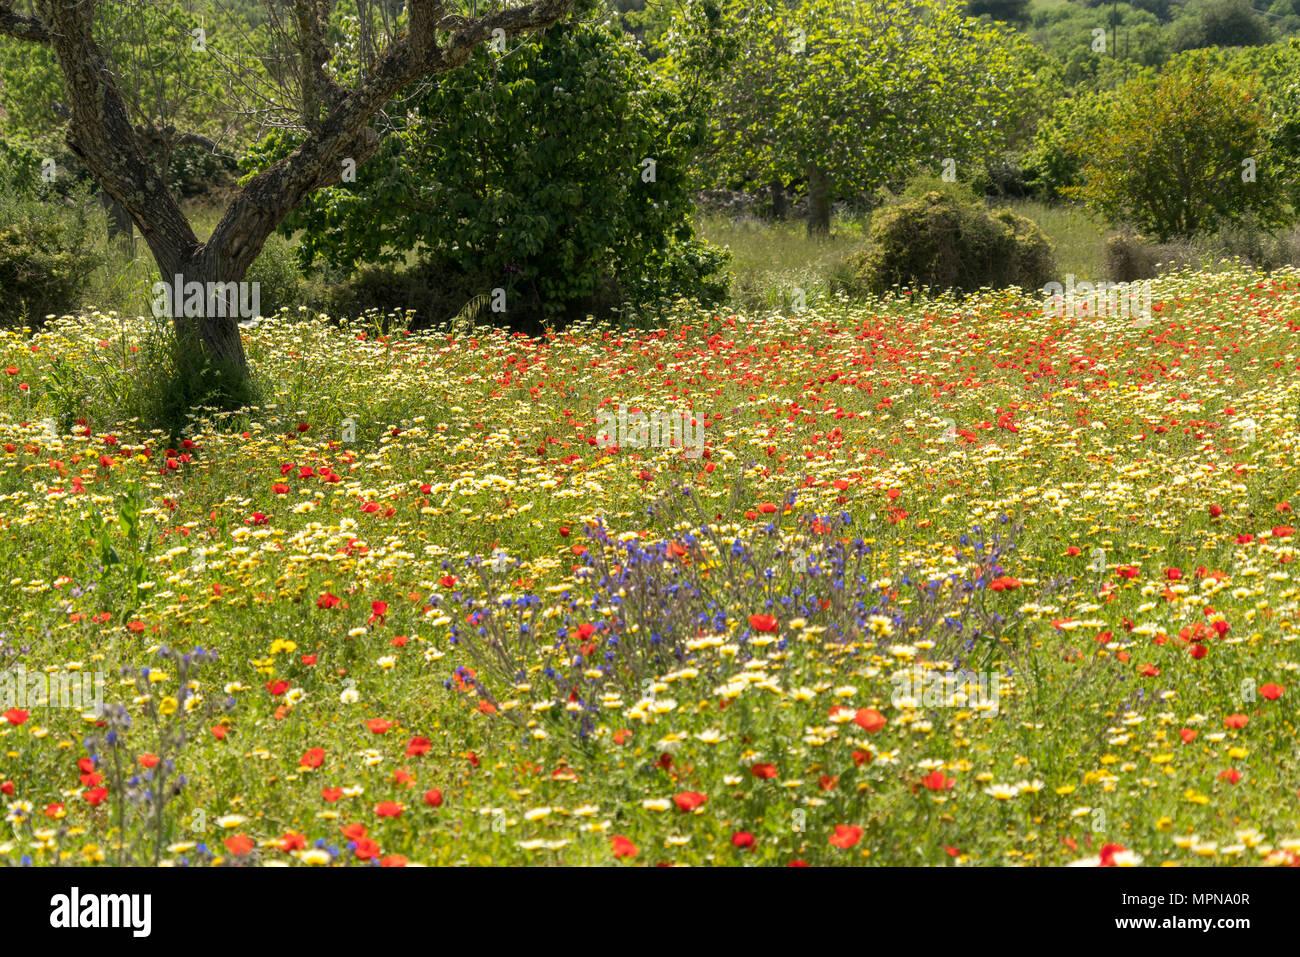 Wiese voller bunter Frhlingsblumen Mallorca Balearen Spanien  Frhlingswiese mit bunten